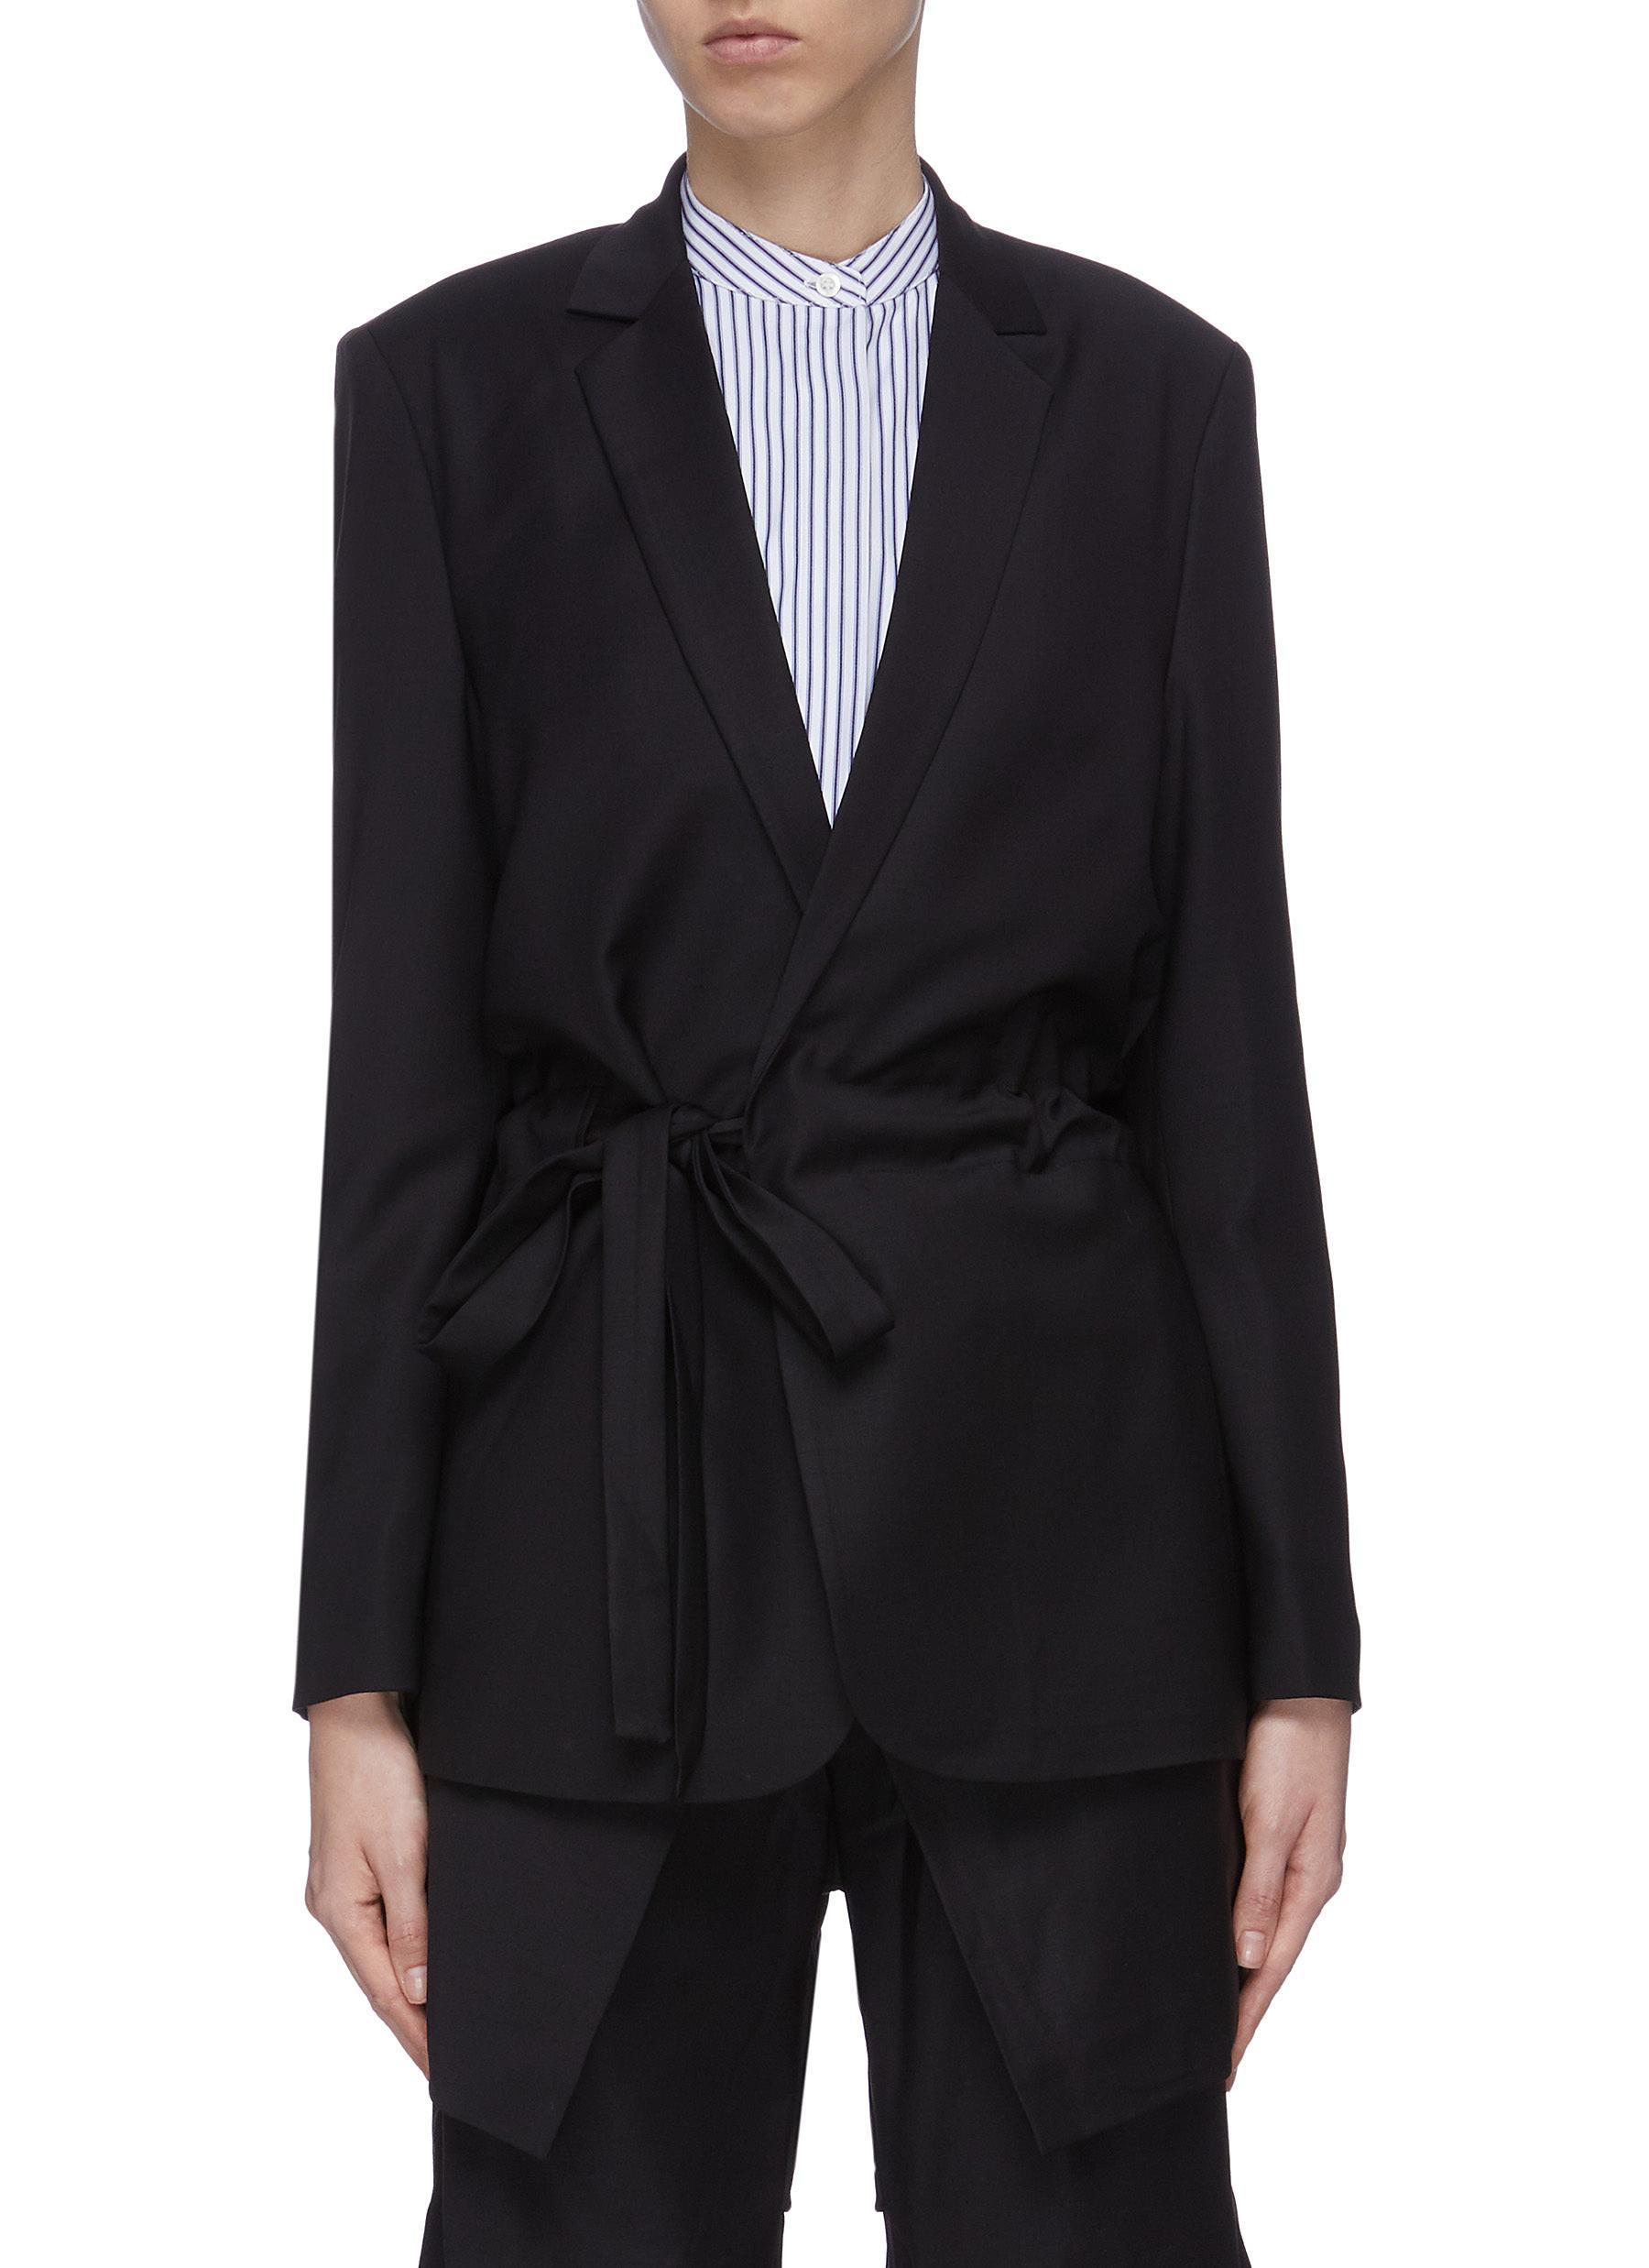 Buy Ffixxed Studios Blazers 'Wutong' notch lapel belted wool-blend blazer